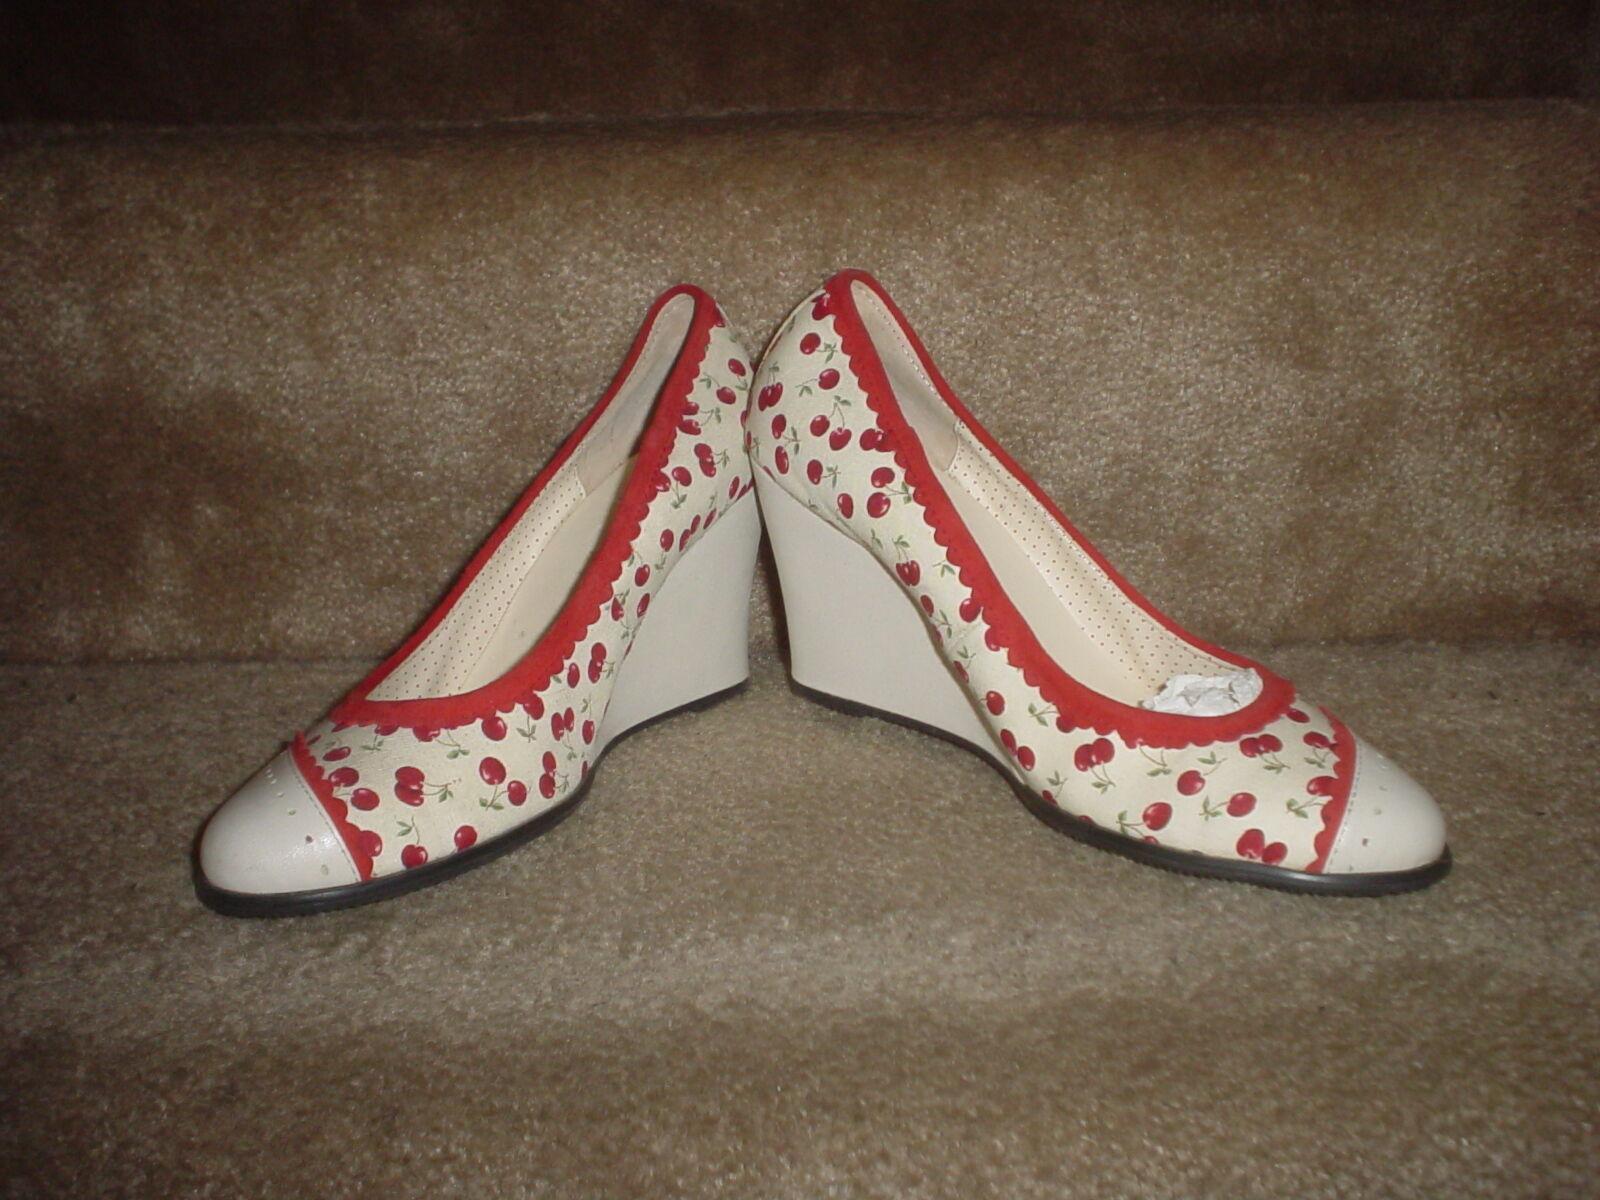 WOMENS DRAVEN (FORBIDDEN BLOSSOM- NAT. & CHERRY) WEDGE HEEL SLIP-ON SHOES S. 7.5